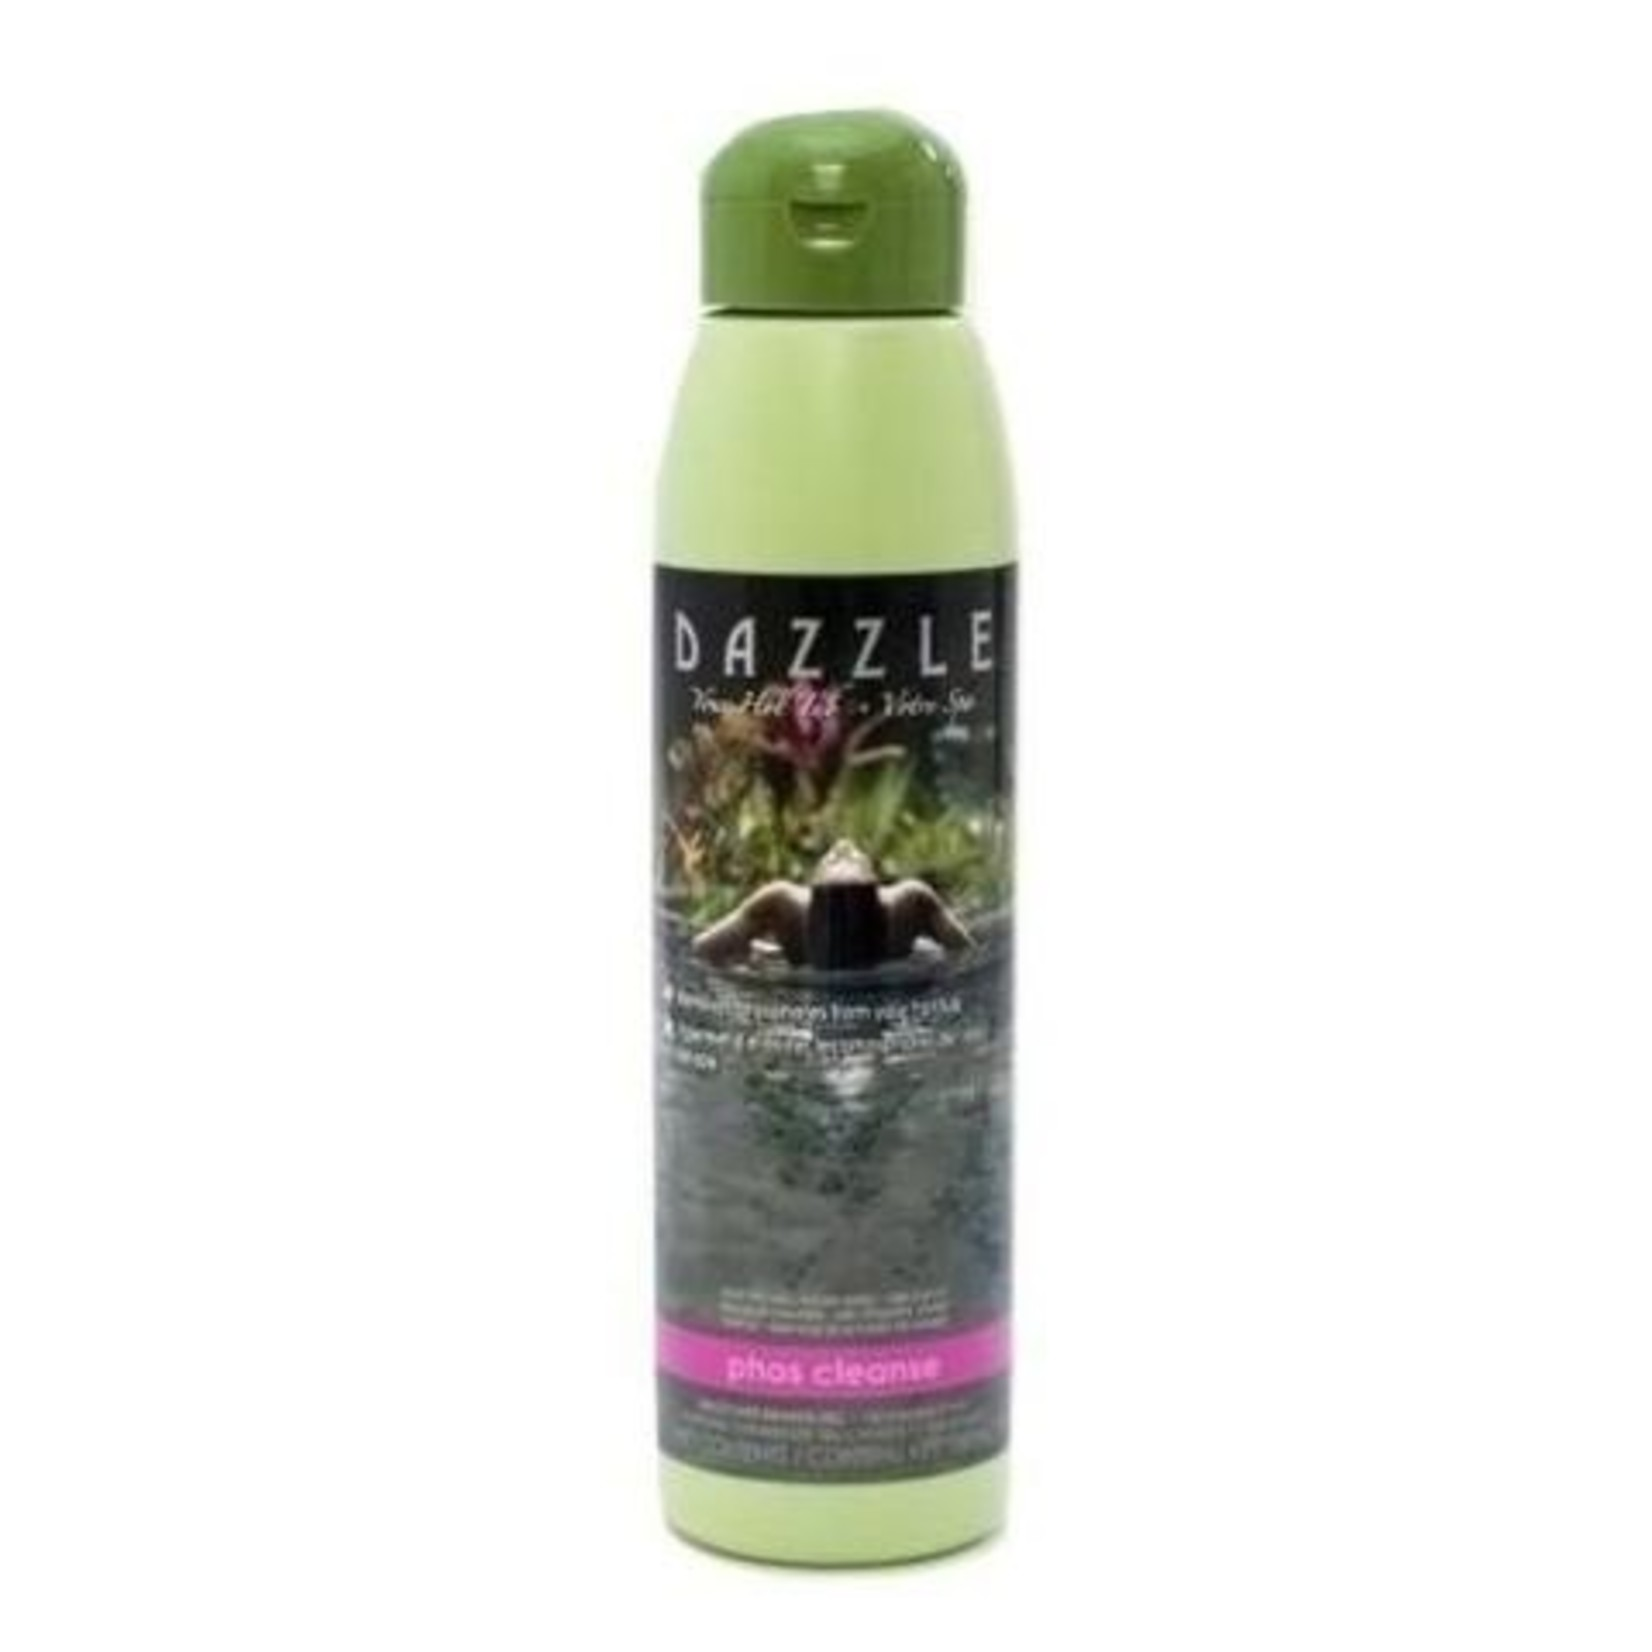 Dazzle Phos Cleanse (750 mL)